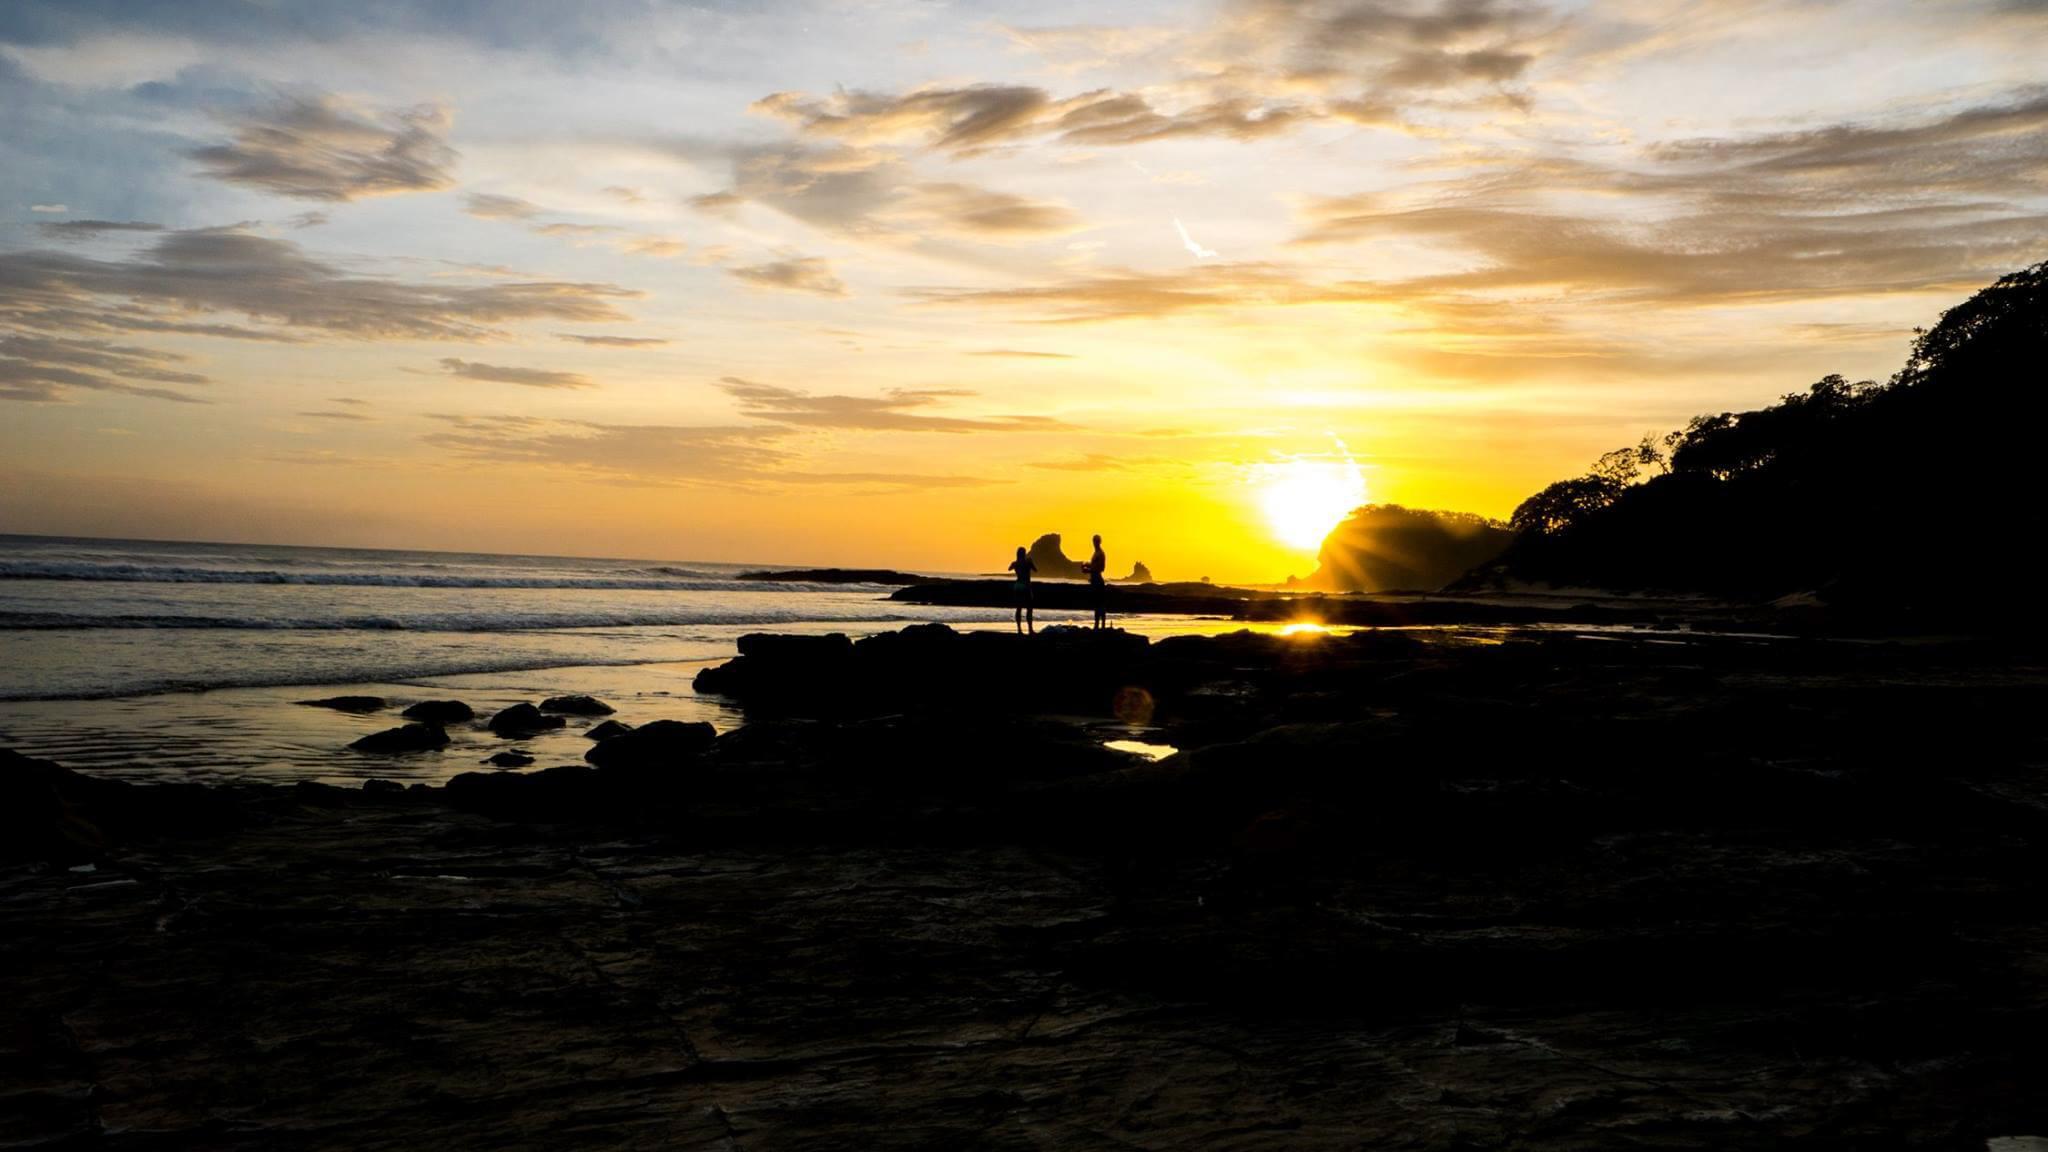 blog-explore-central-america-playa-maderas-nicaragua